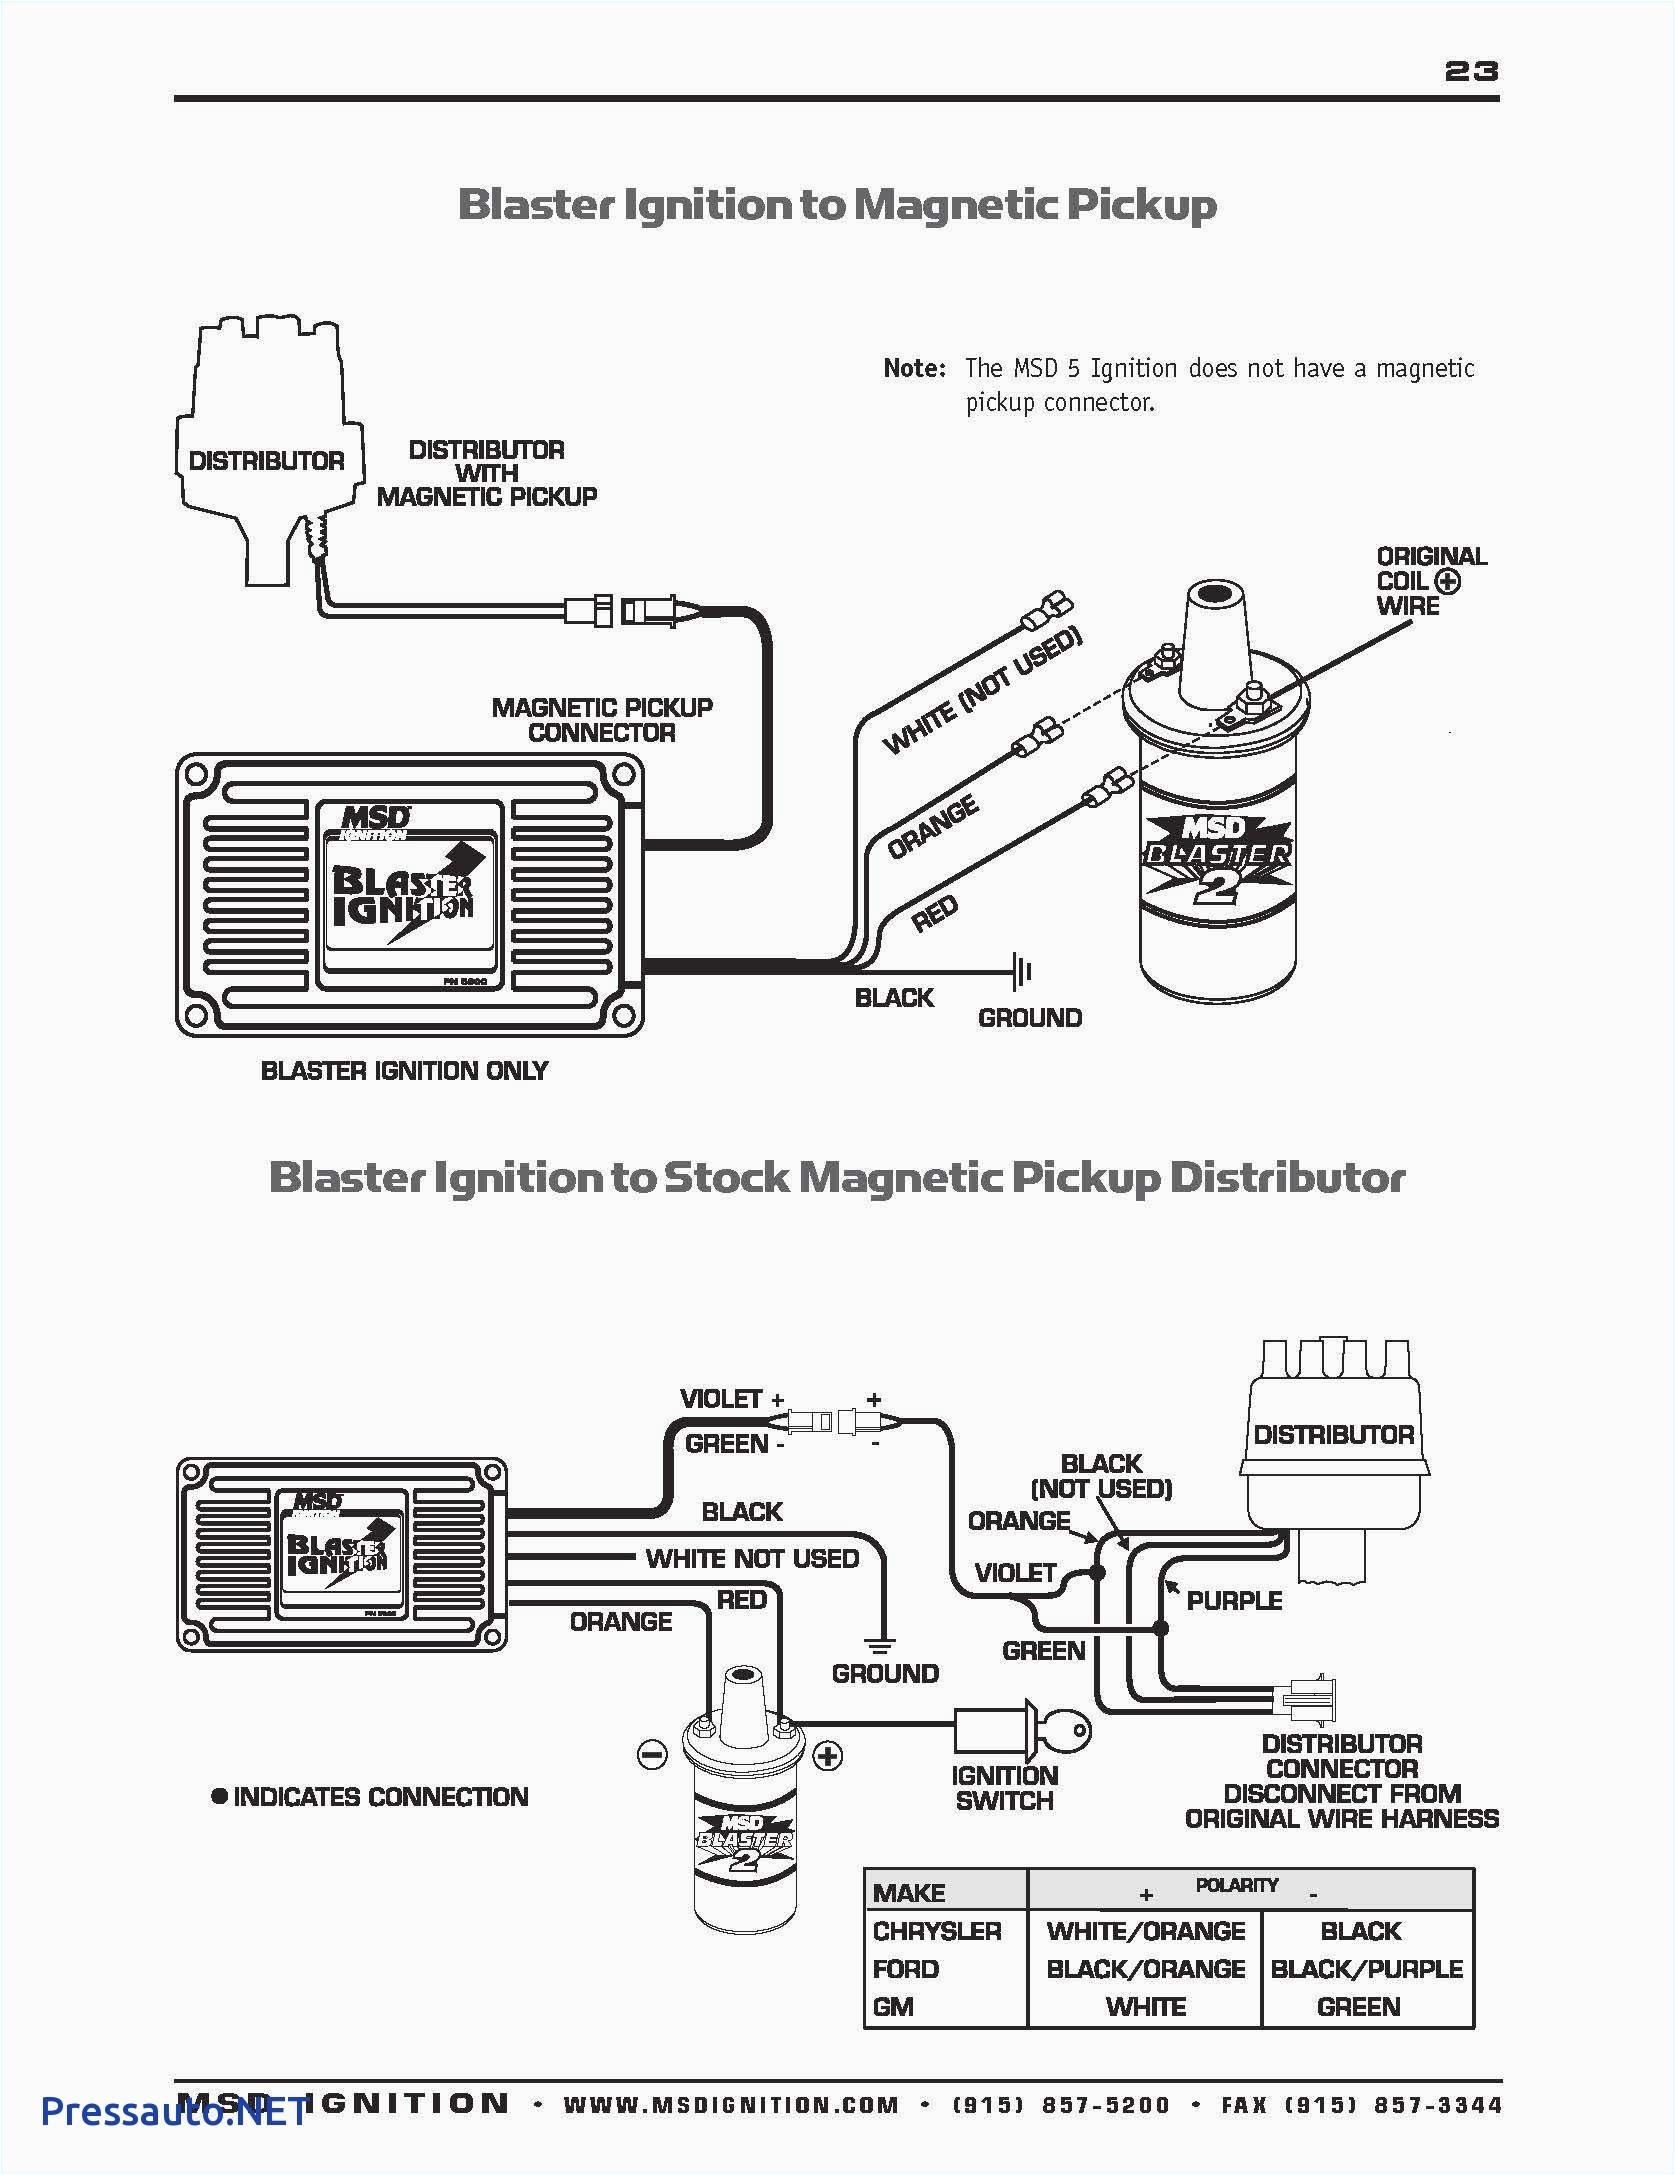 msd 8680 wiring diagram wiring diagrammsd 8680 wiring diagram